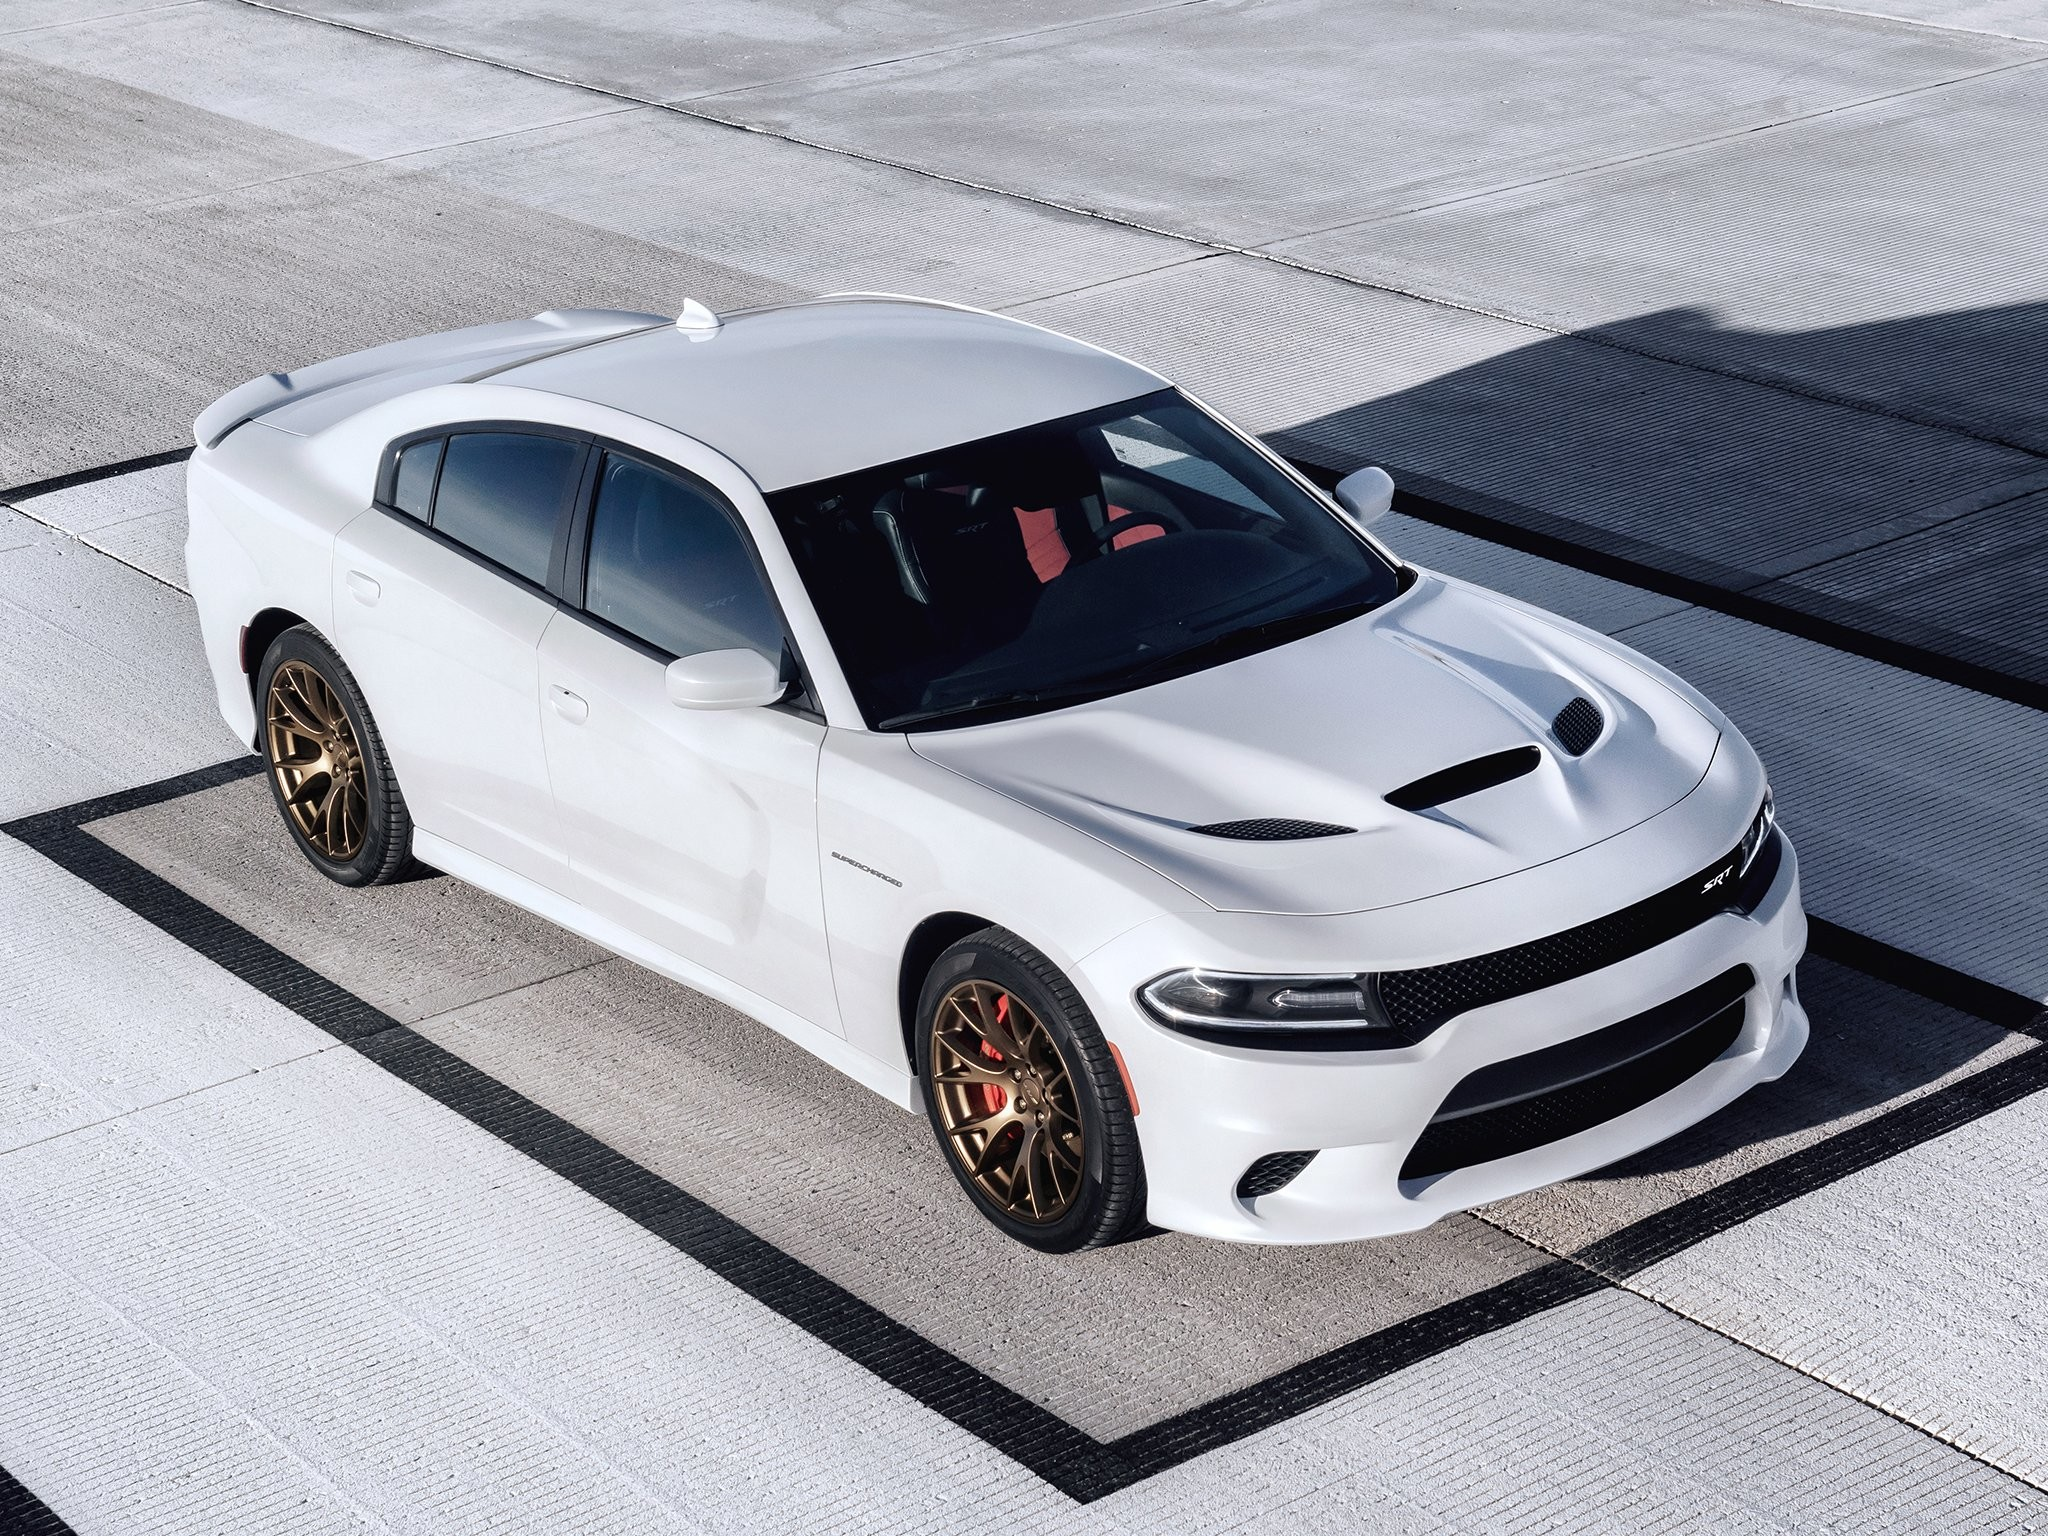 2015 Dodge Charger SRT Hellcat L-D muscle dw wallpaper | | 423676  | WallpaperUP